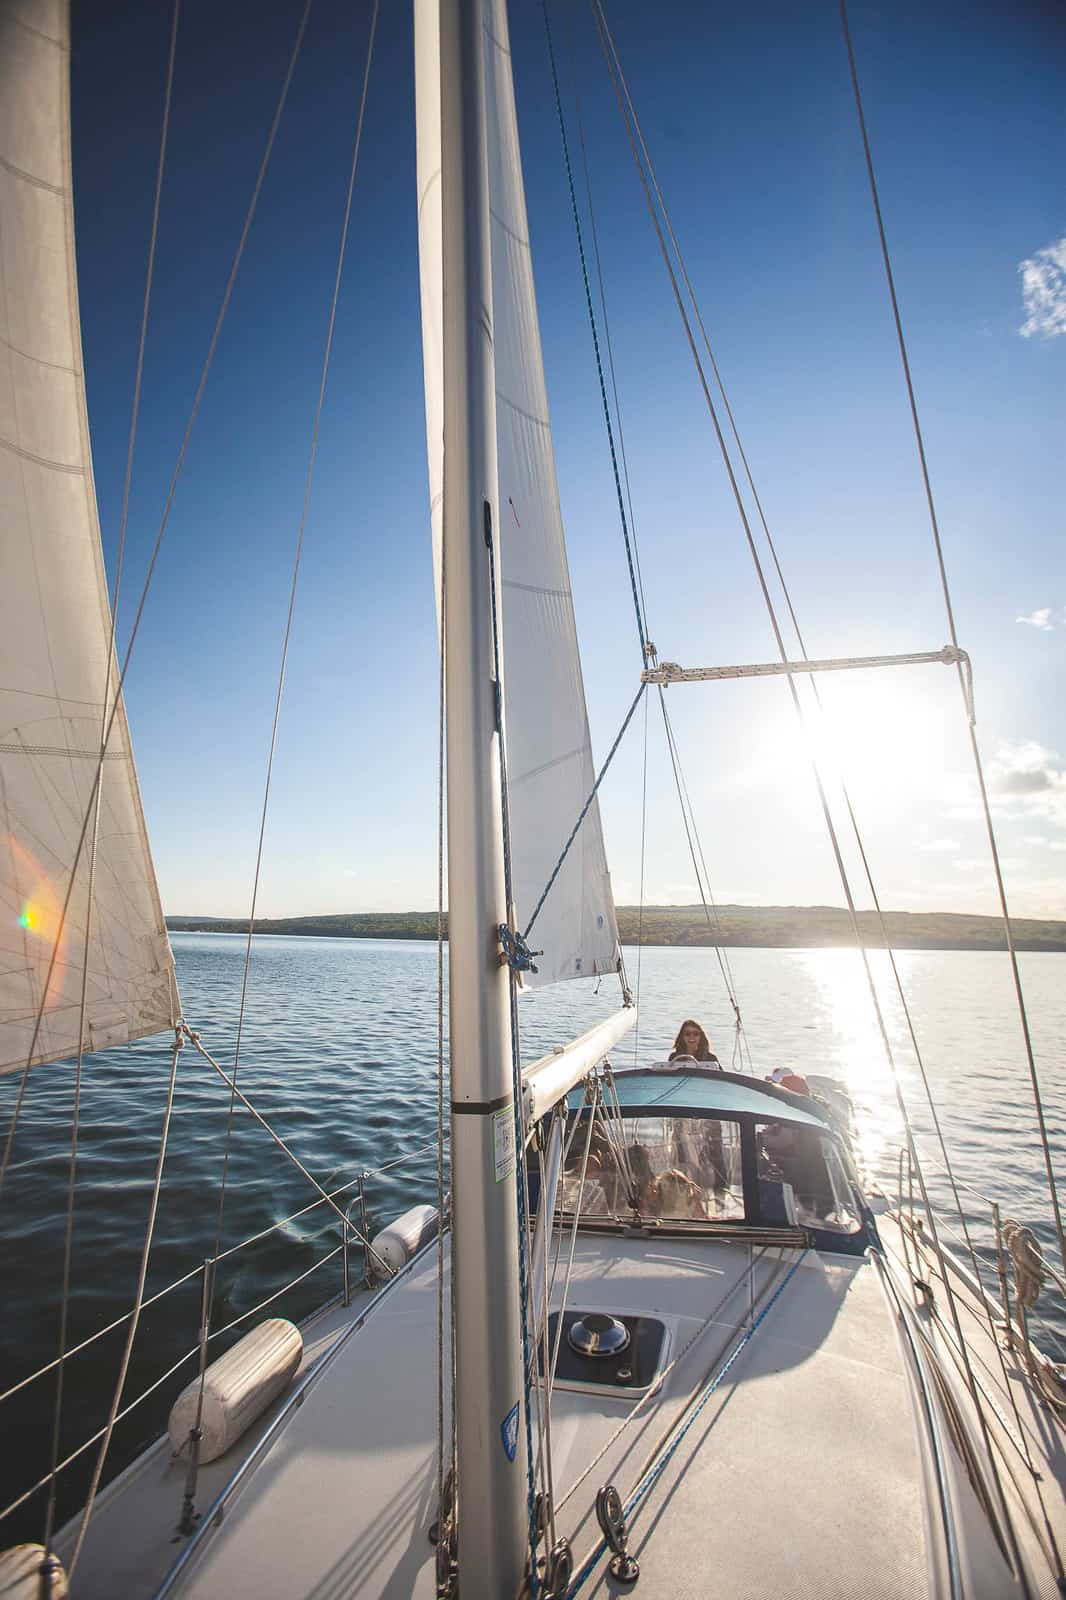 sailboat on Lake Superior